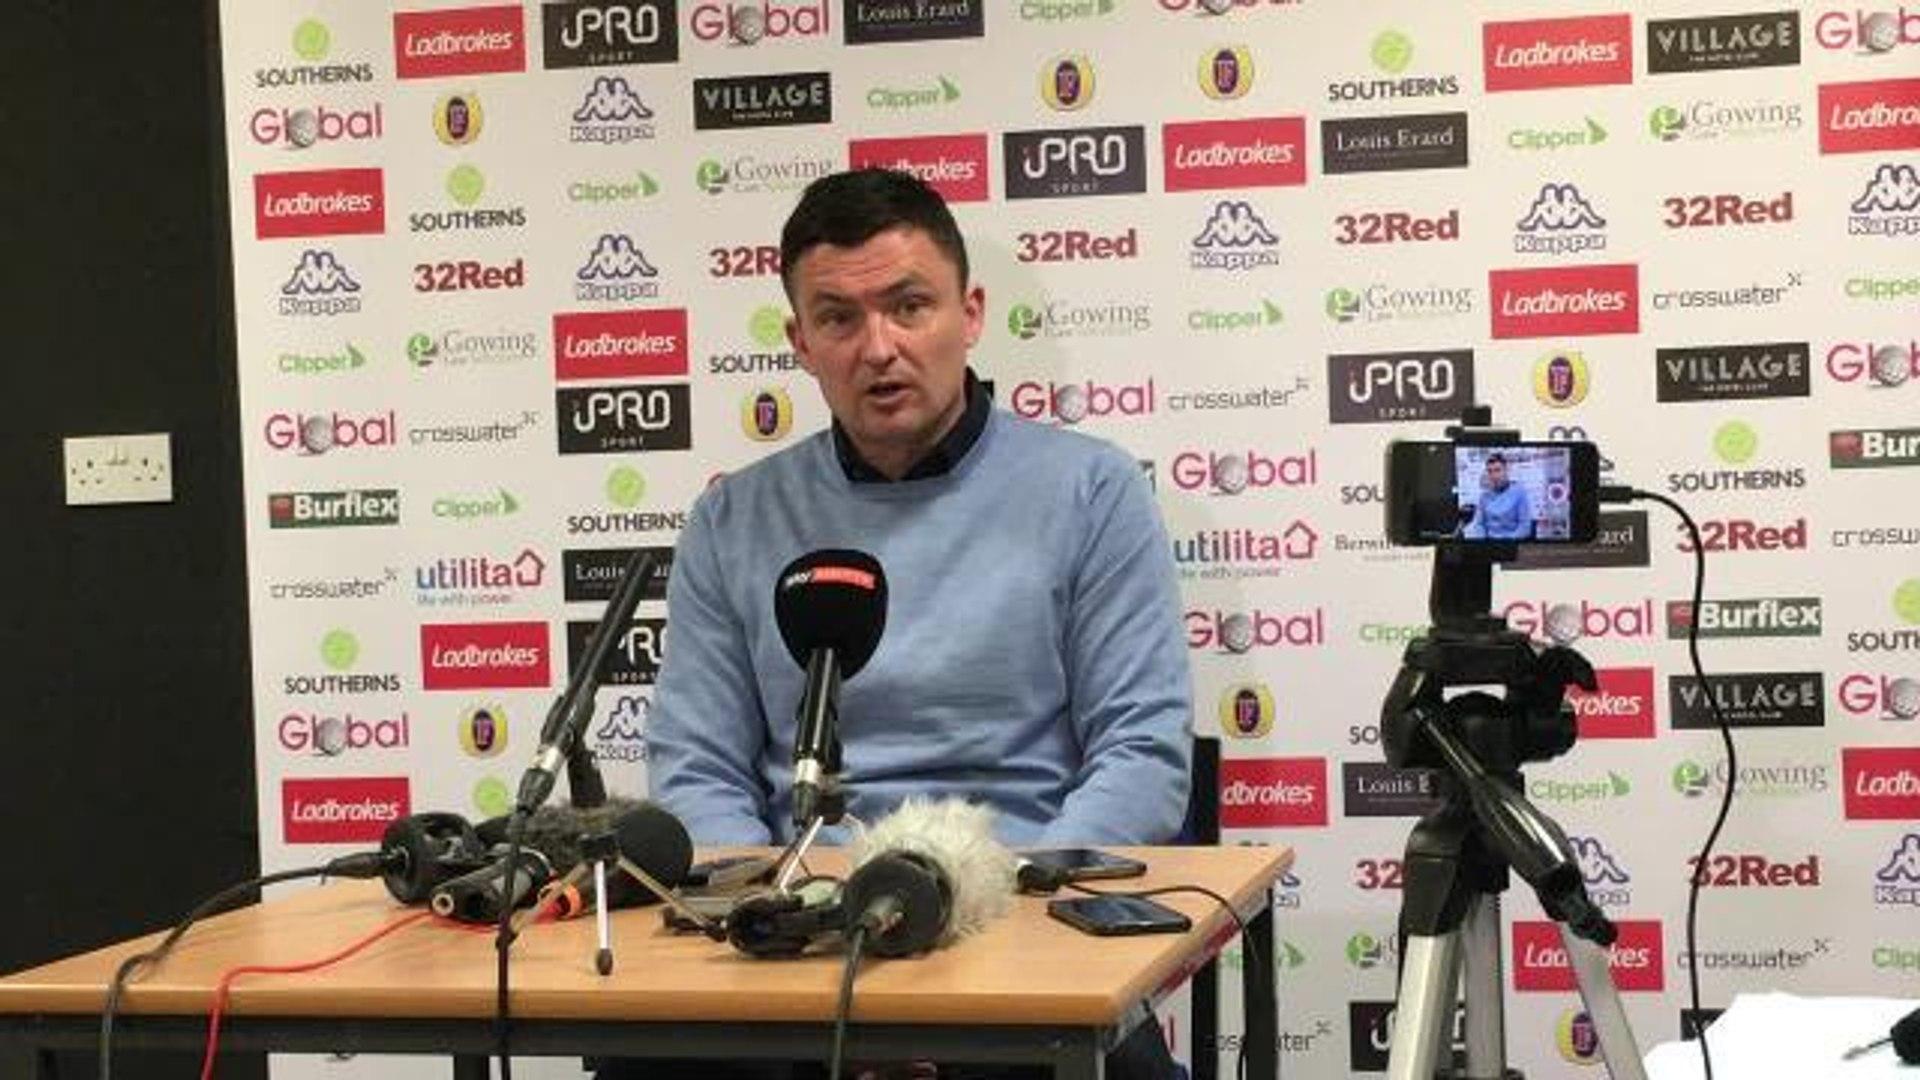 Paul Heckingbottom speaks to the media ahead of Sheffield Wednesday visit.